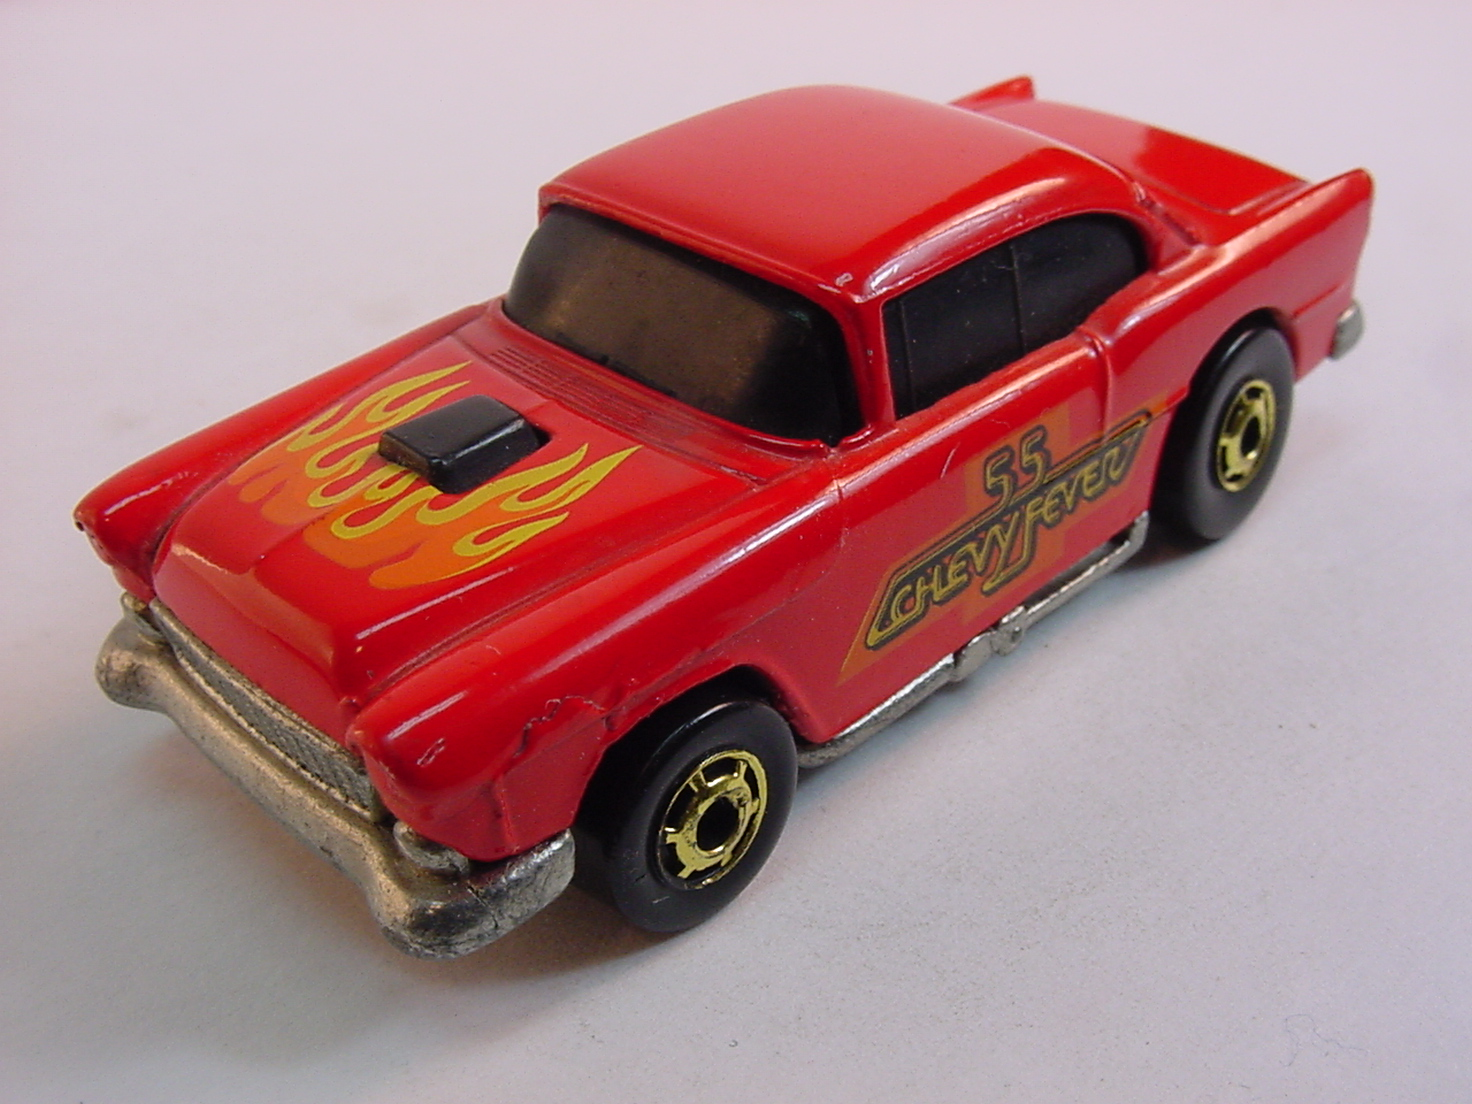 '55 Chevy (1982)